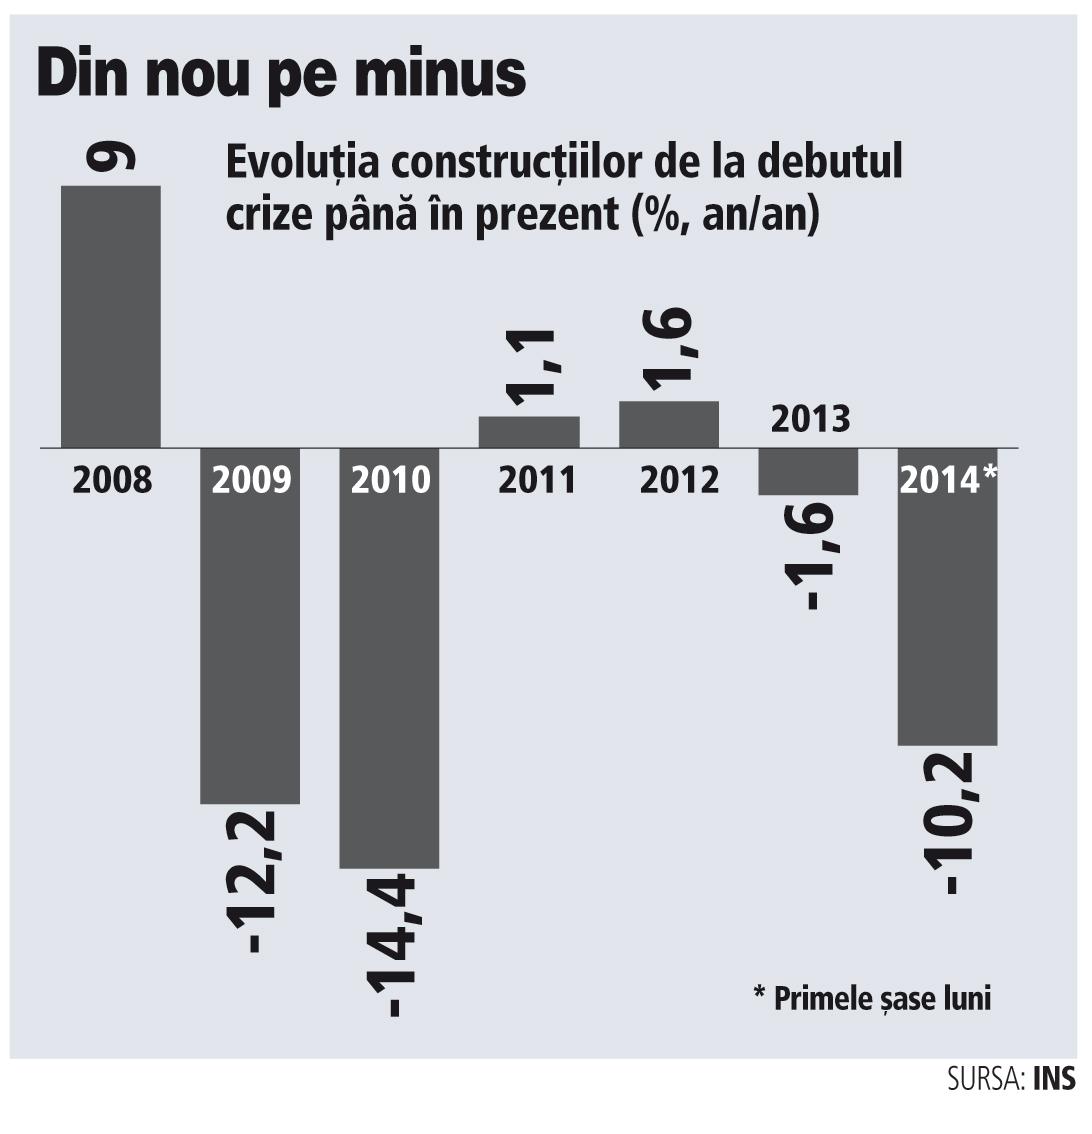 Evolutia constructiilor de la debutul crizei p�na �n prezent ...